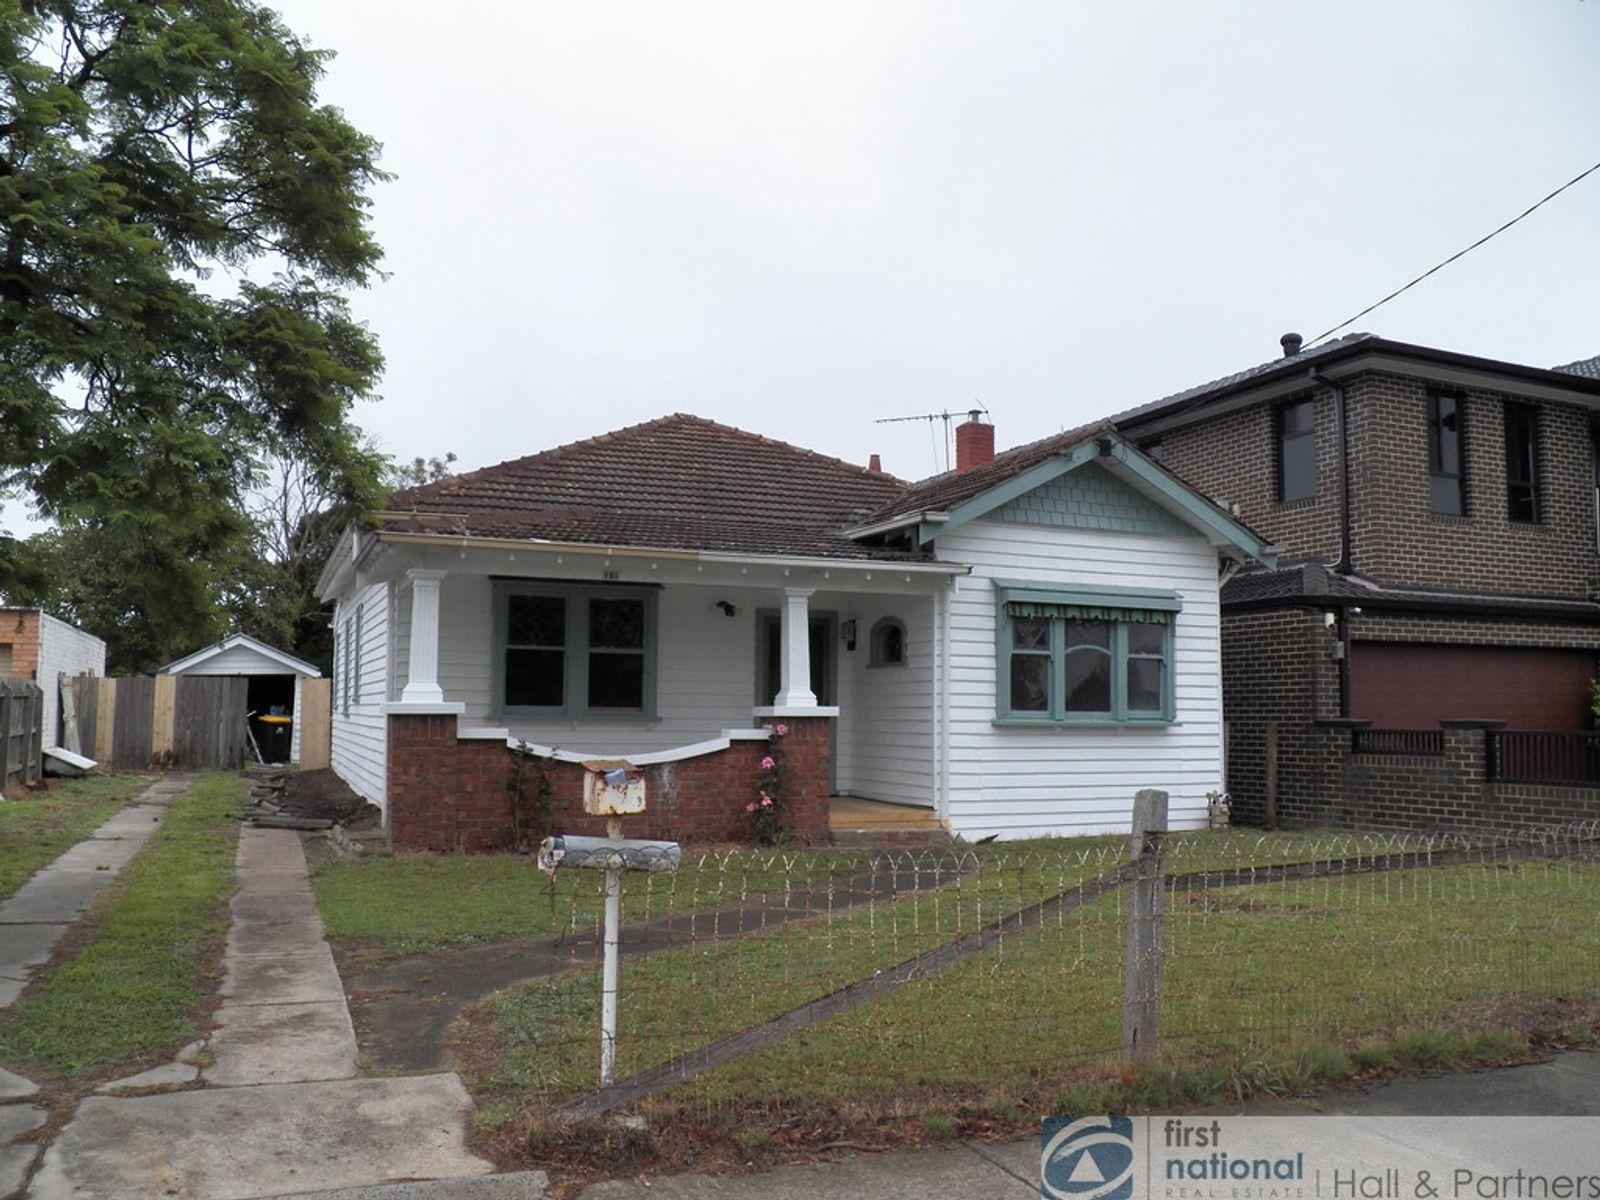 196 Foster Street, Dandenong, VIC 3175